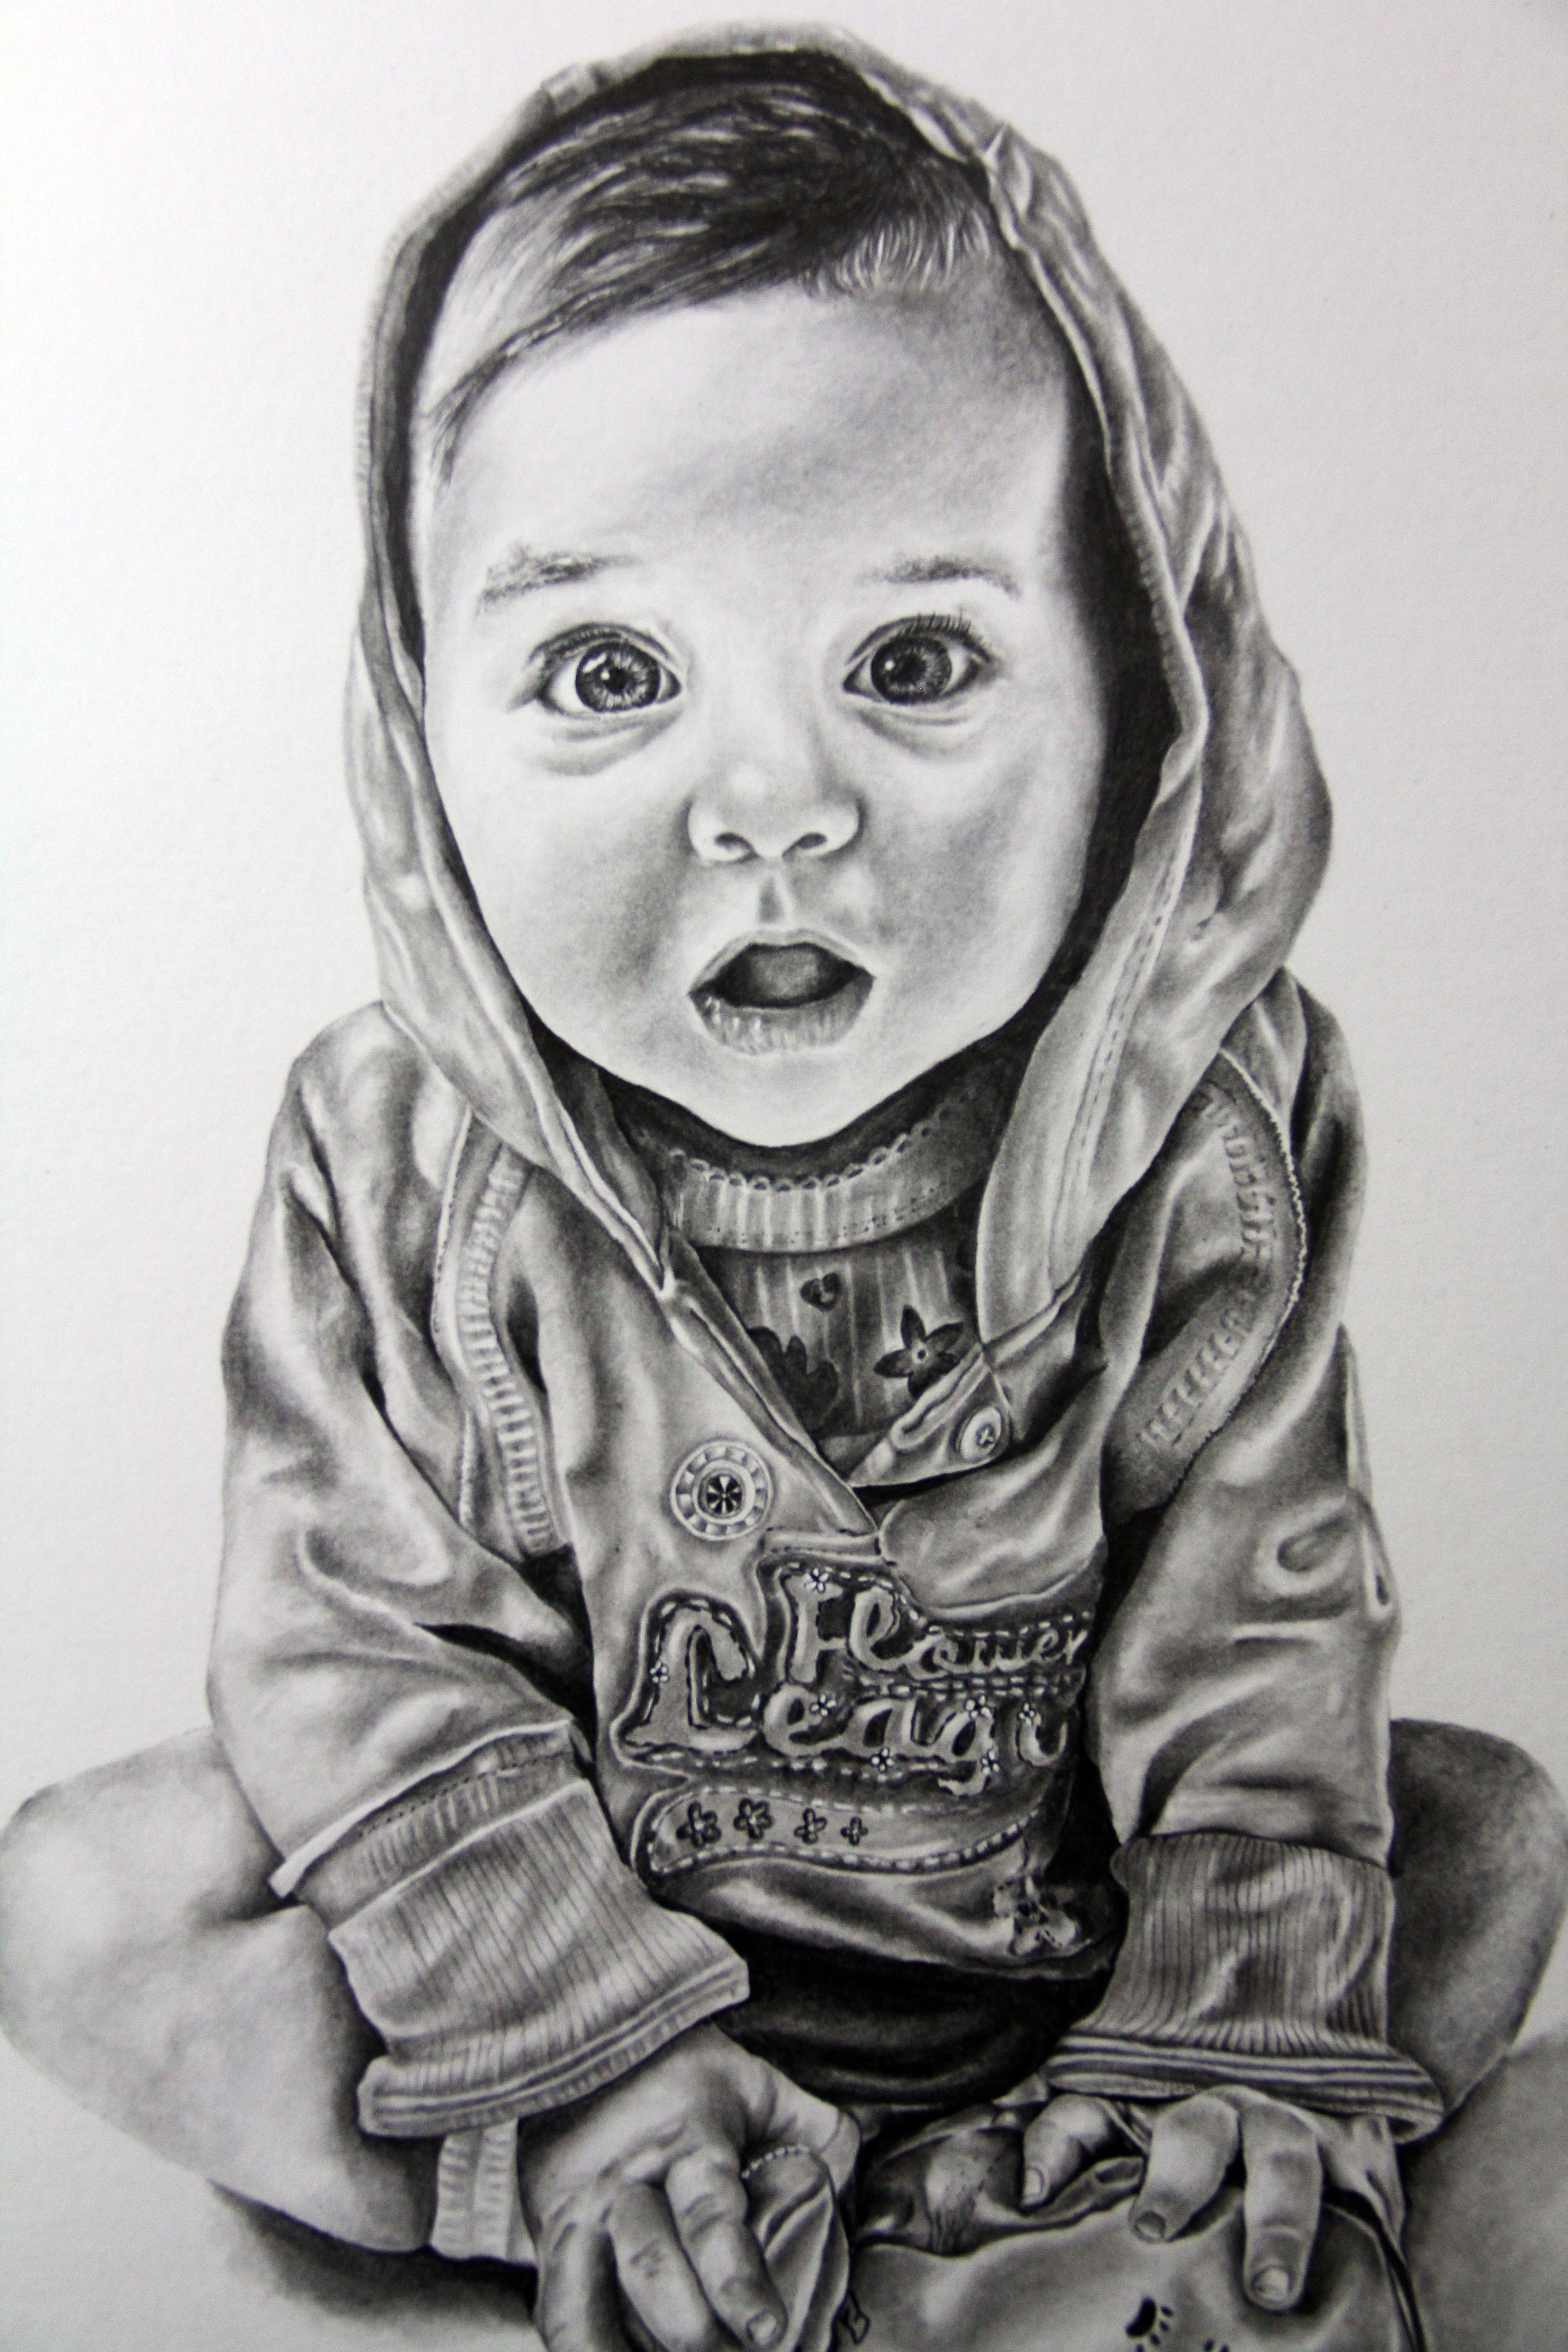 Baby child art portrait in pencil drawing by iigurrydaddyii deviantart com on deviantart